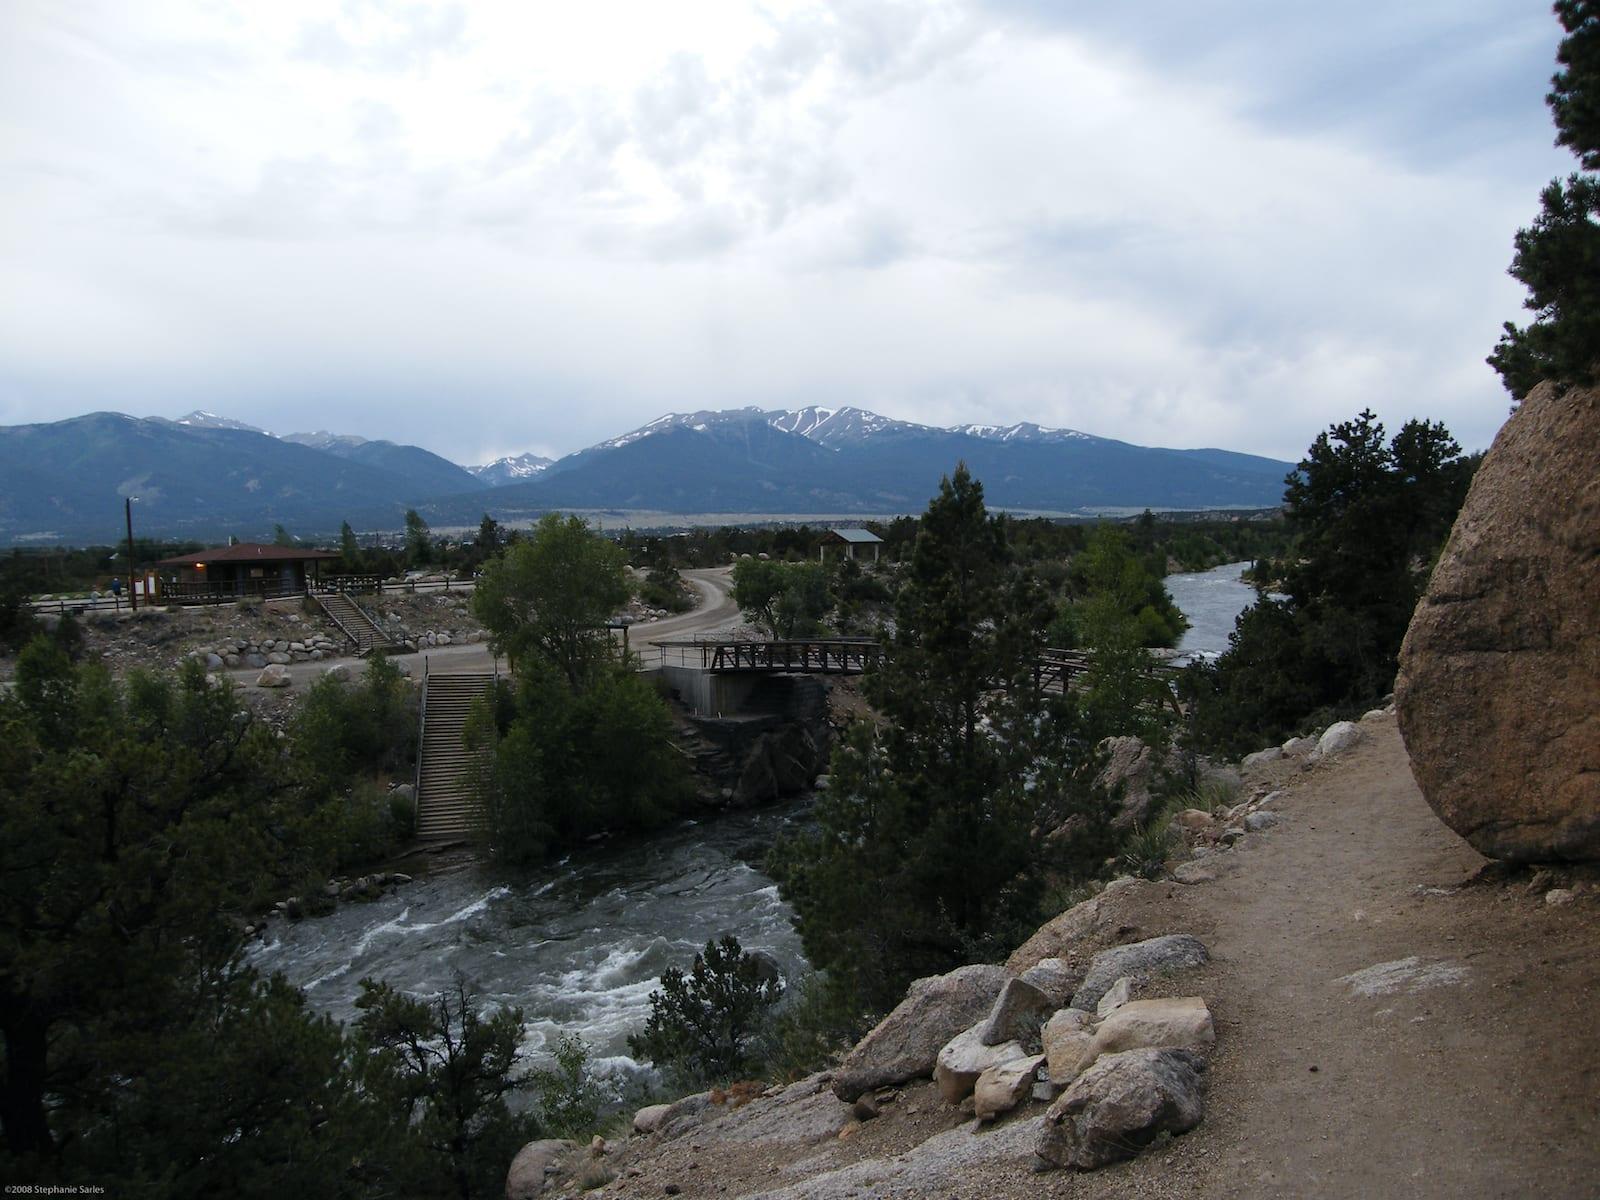 River Park, Barbara Whipple Trail Mendaki Buena Vista CO